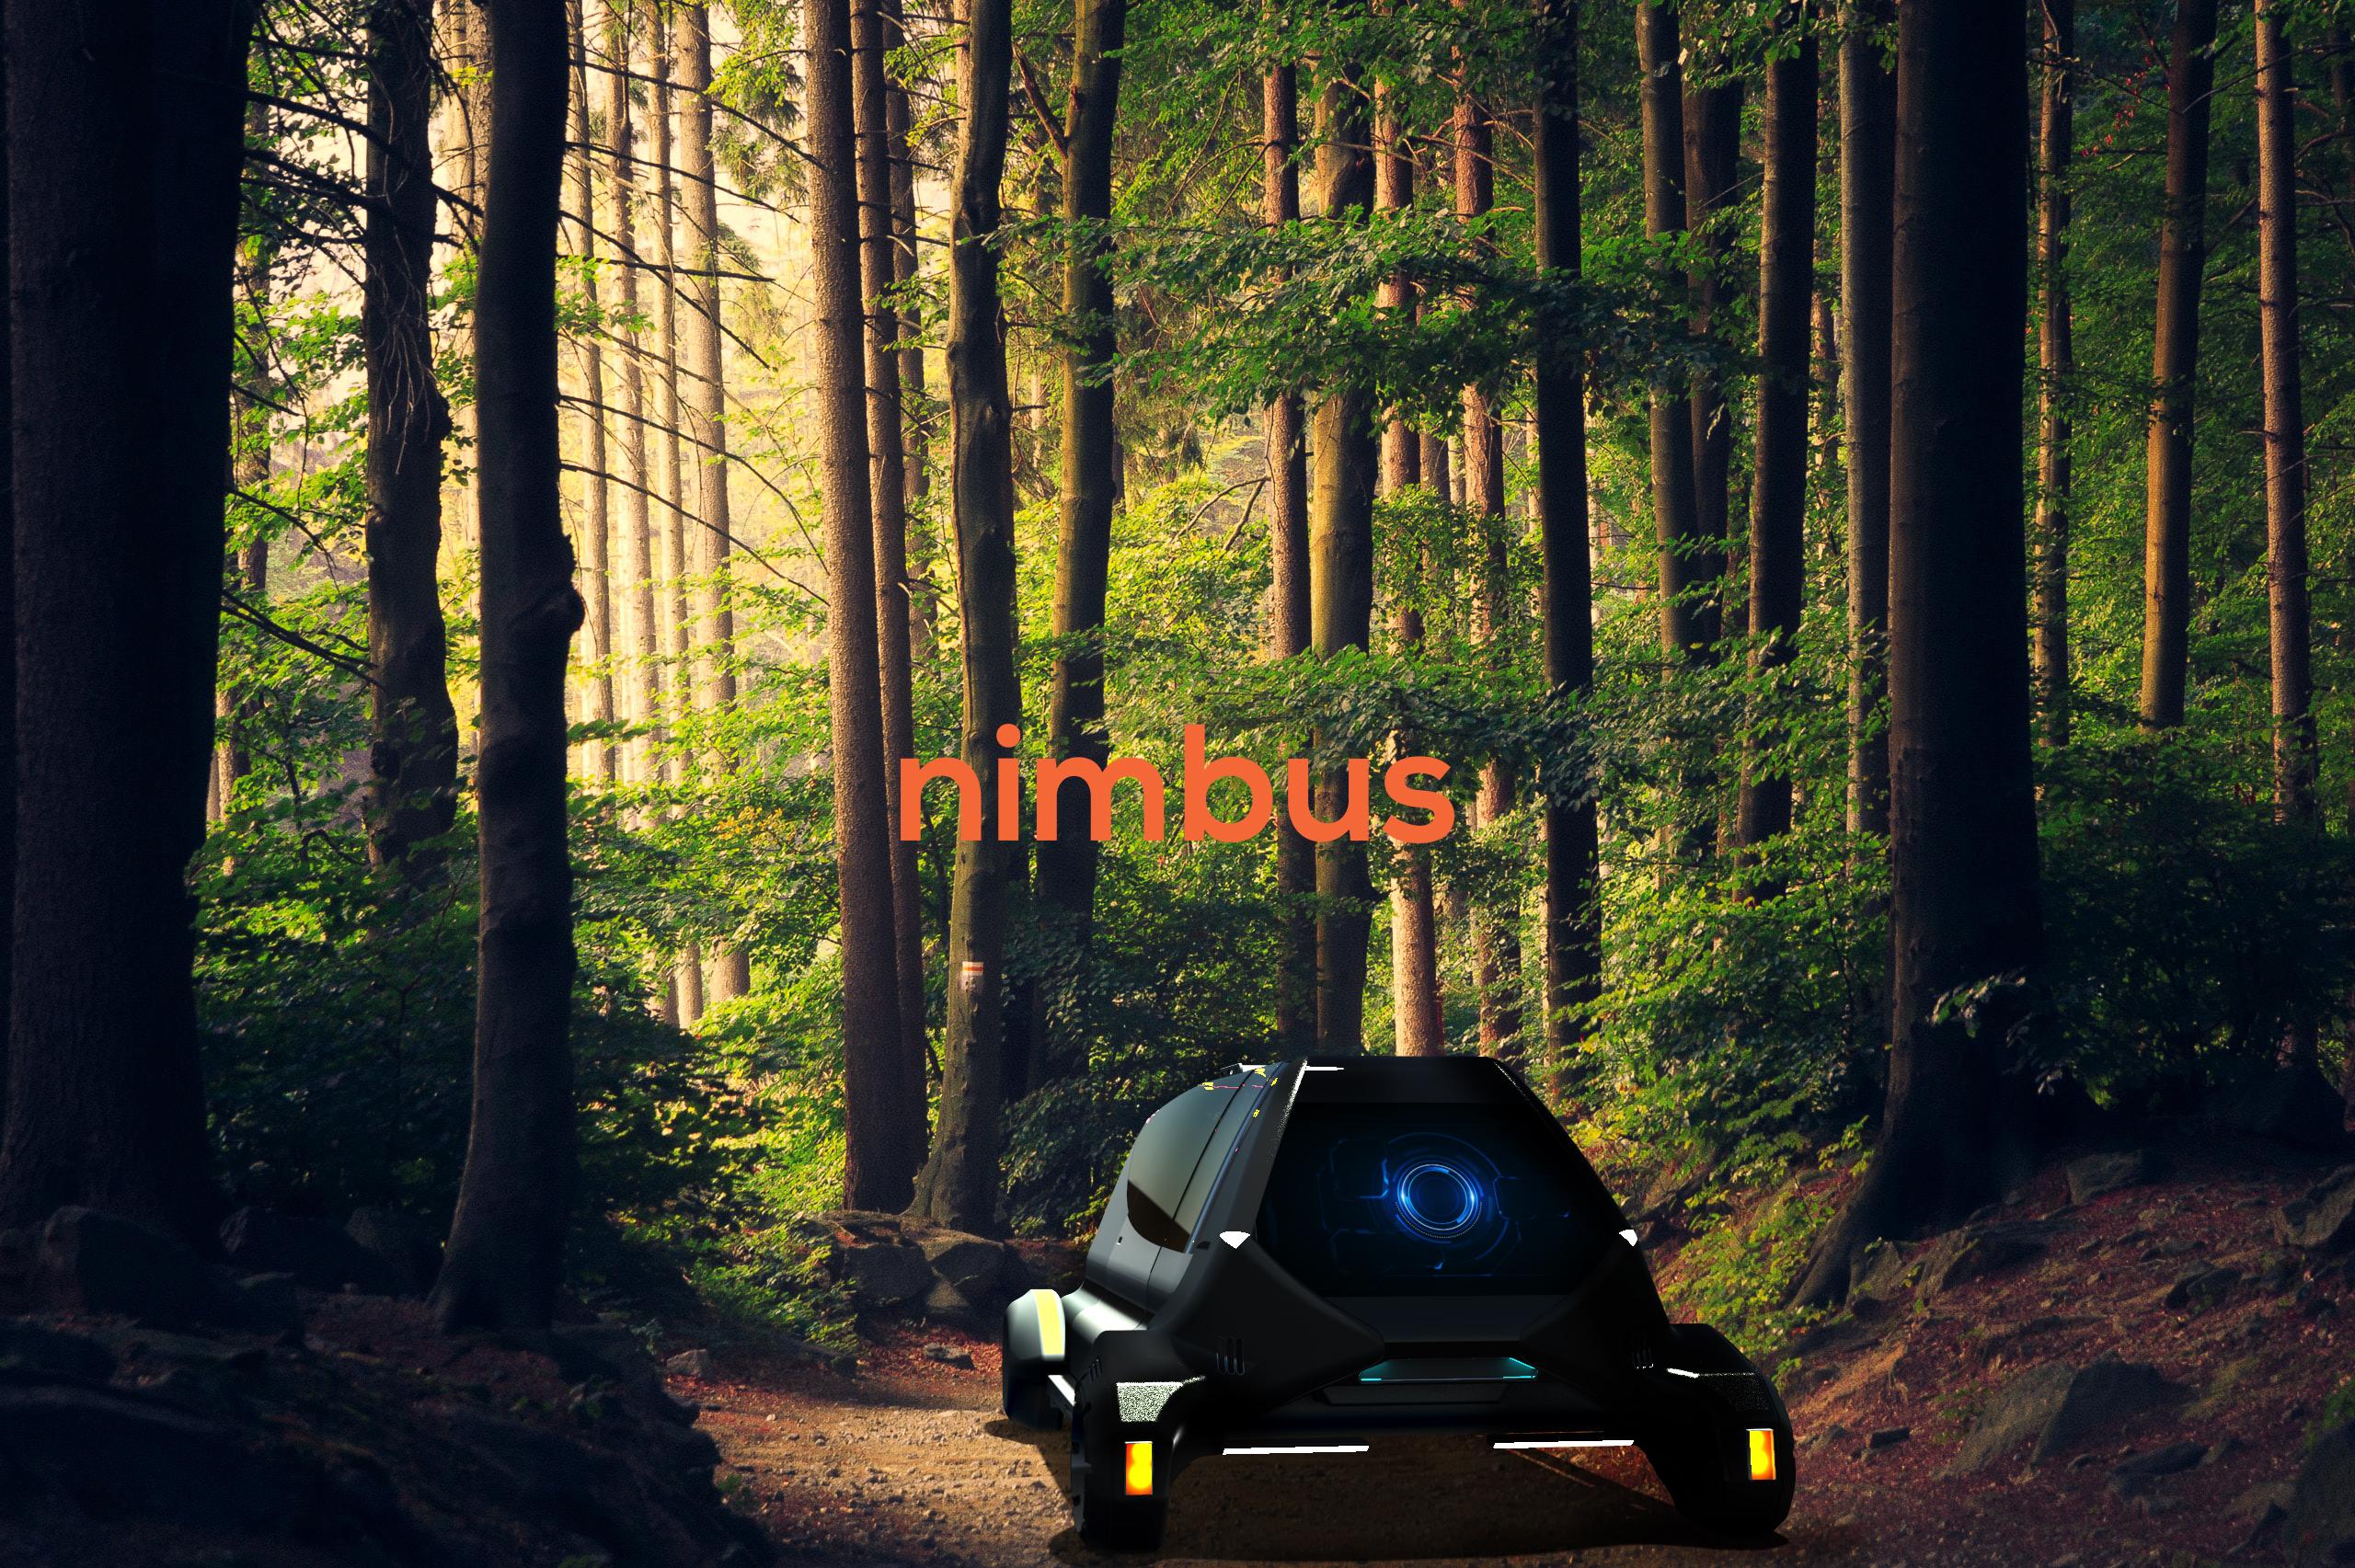 Nimbus –Adventure Awaits